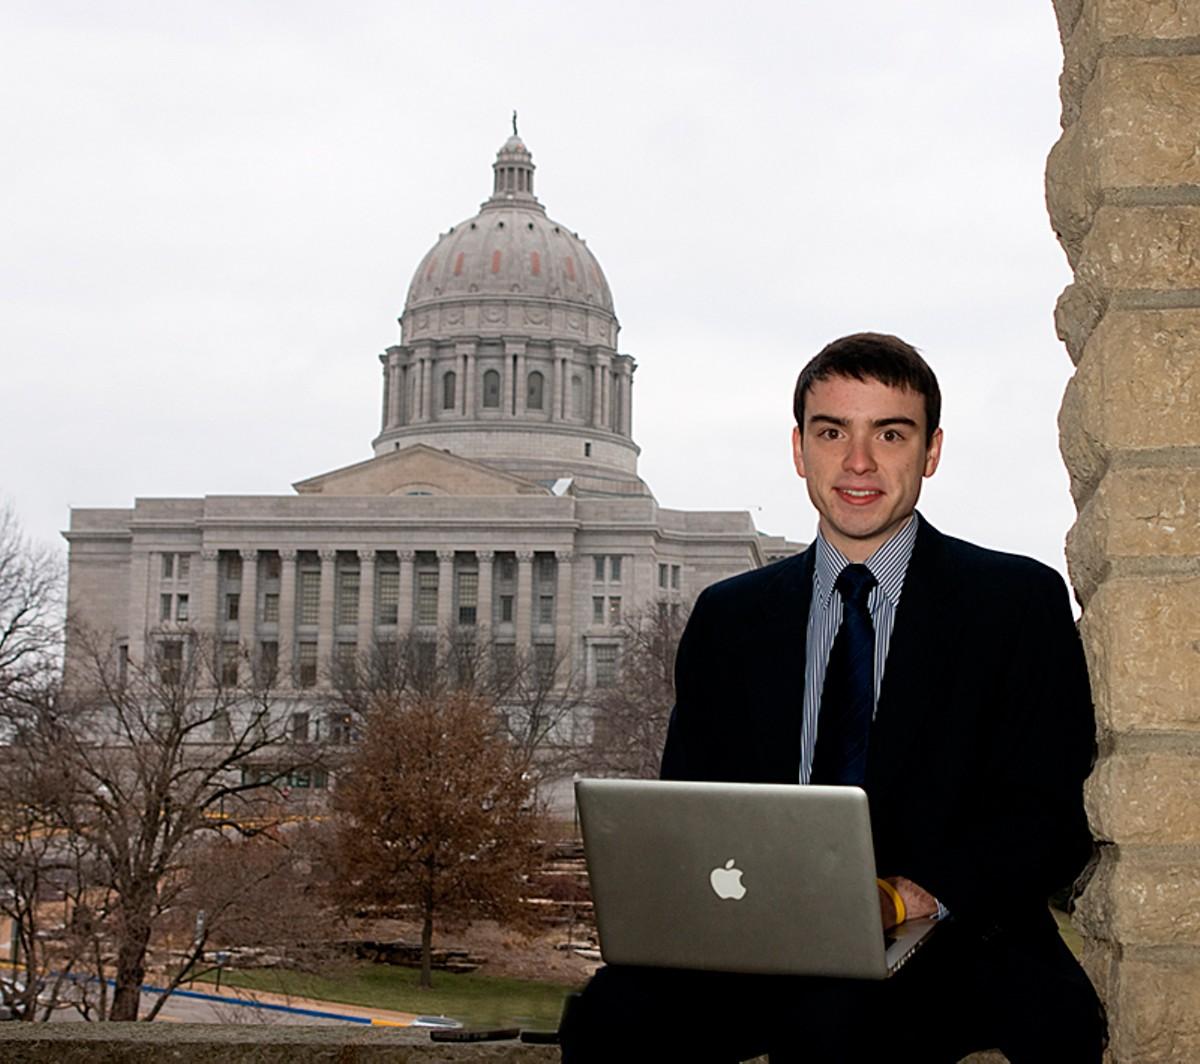 Best Political Blog blogger Eli Yokley. Read a profile of Yokley here.